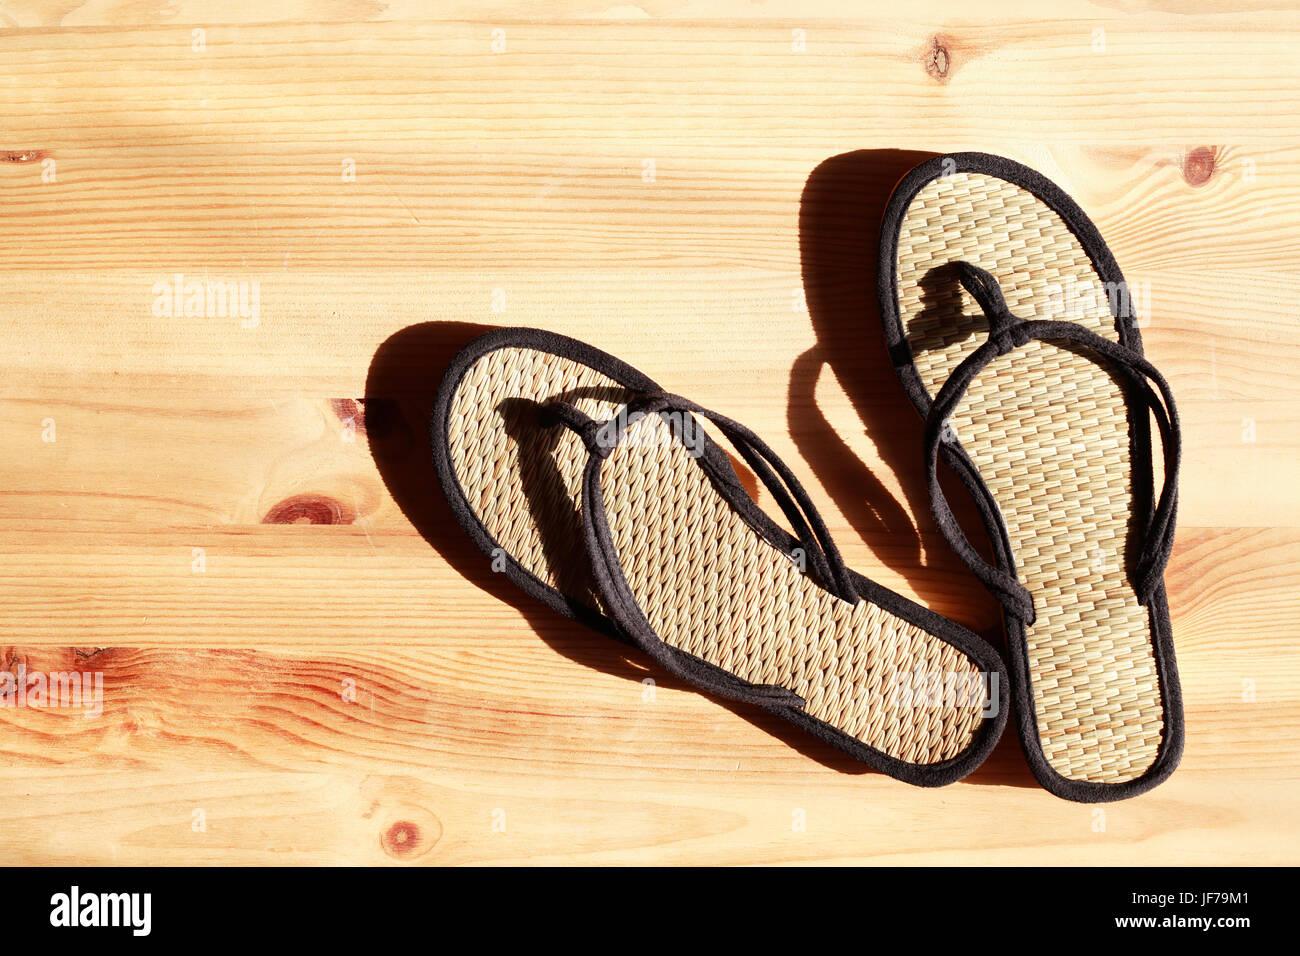 b57032c4f37 Pair of female flip-flops on wooden floor under sunbeam - Stock Image